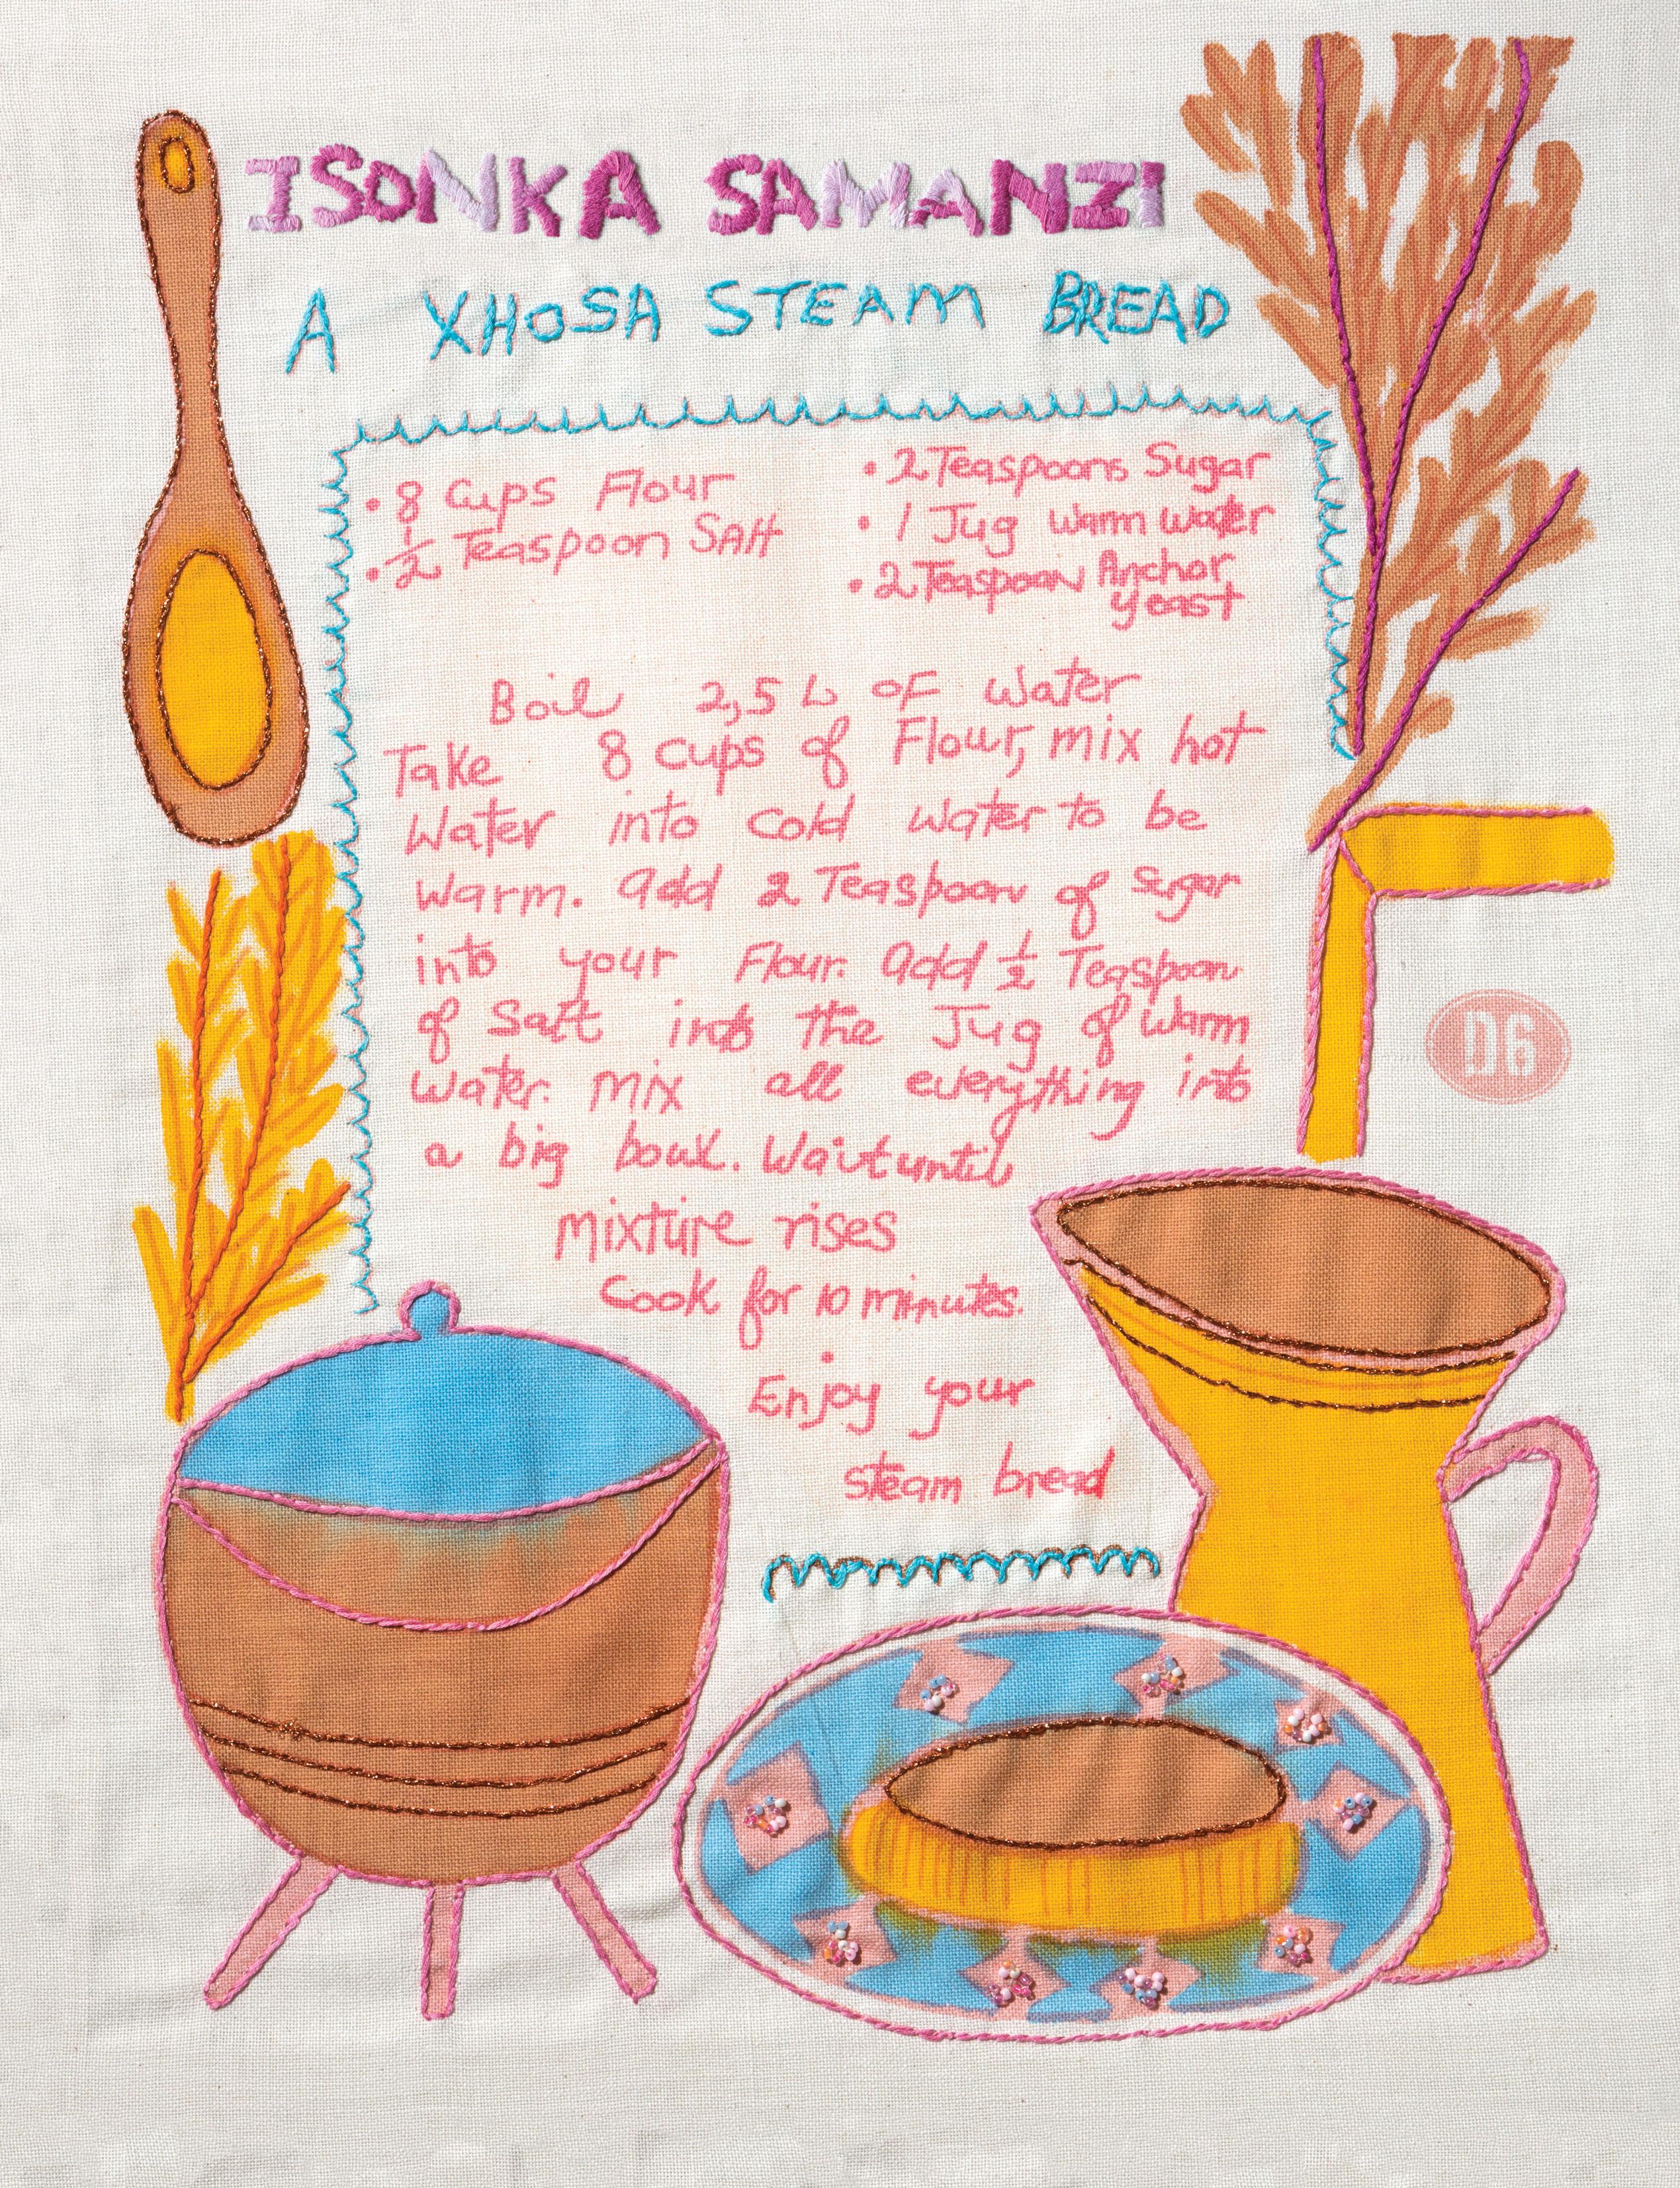 disctict-six-huis-kombuis_isonka-samanzi-xhosa-steam-bread-heritage-budget-recipe